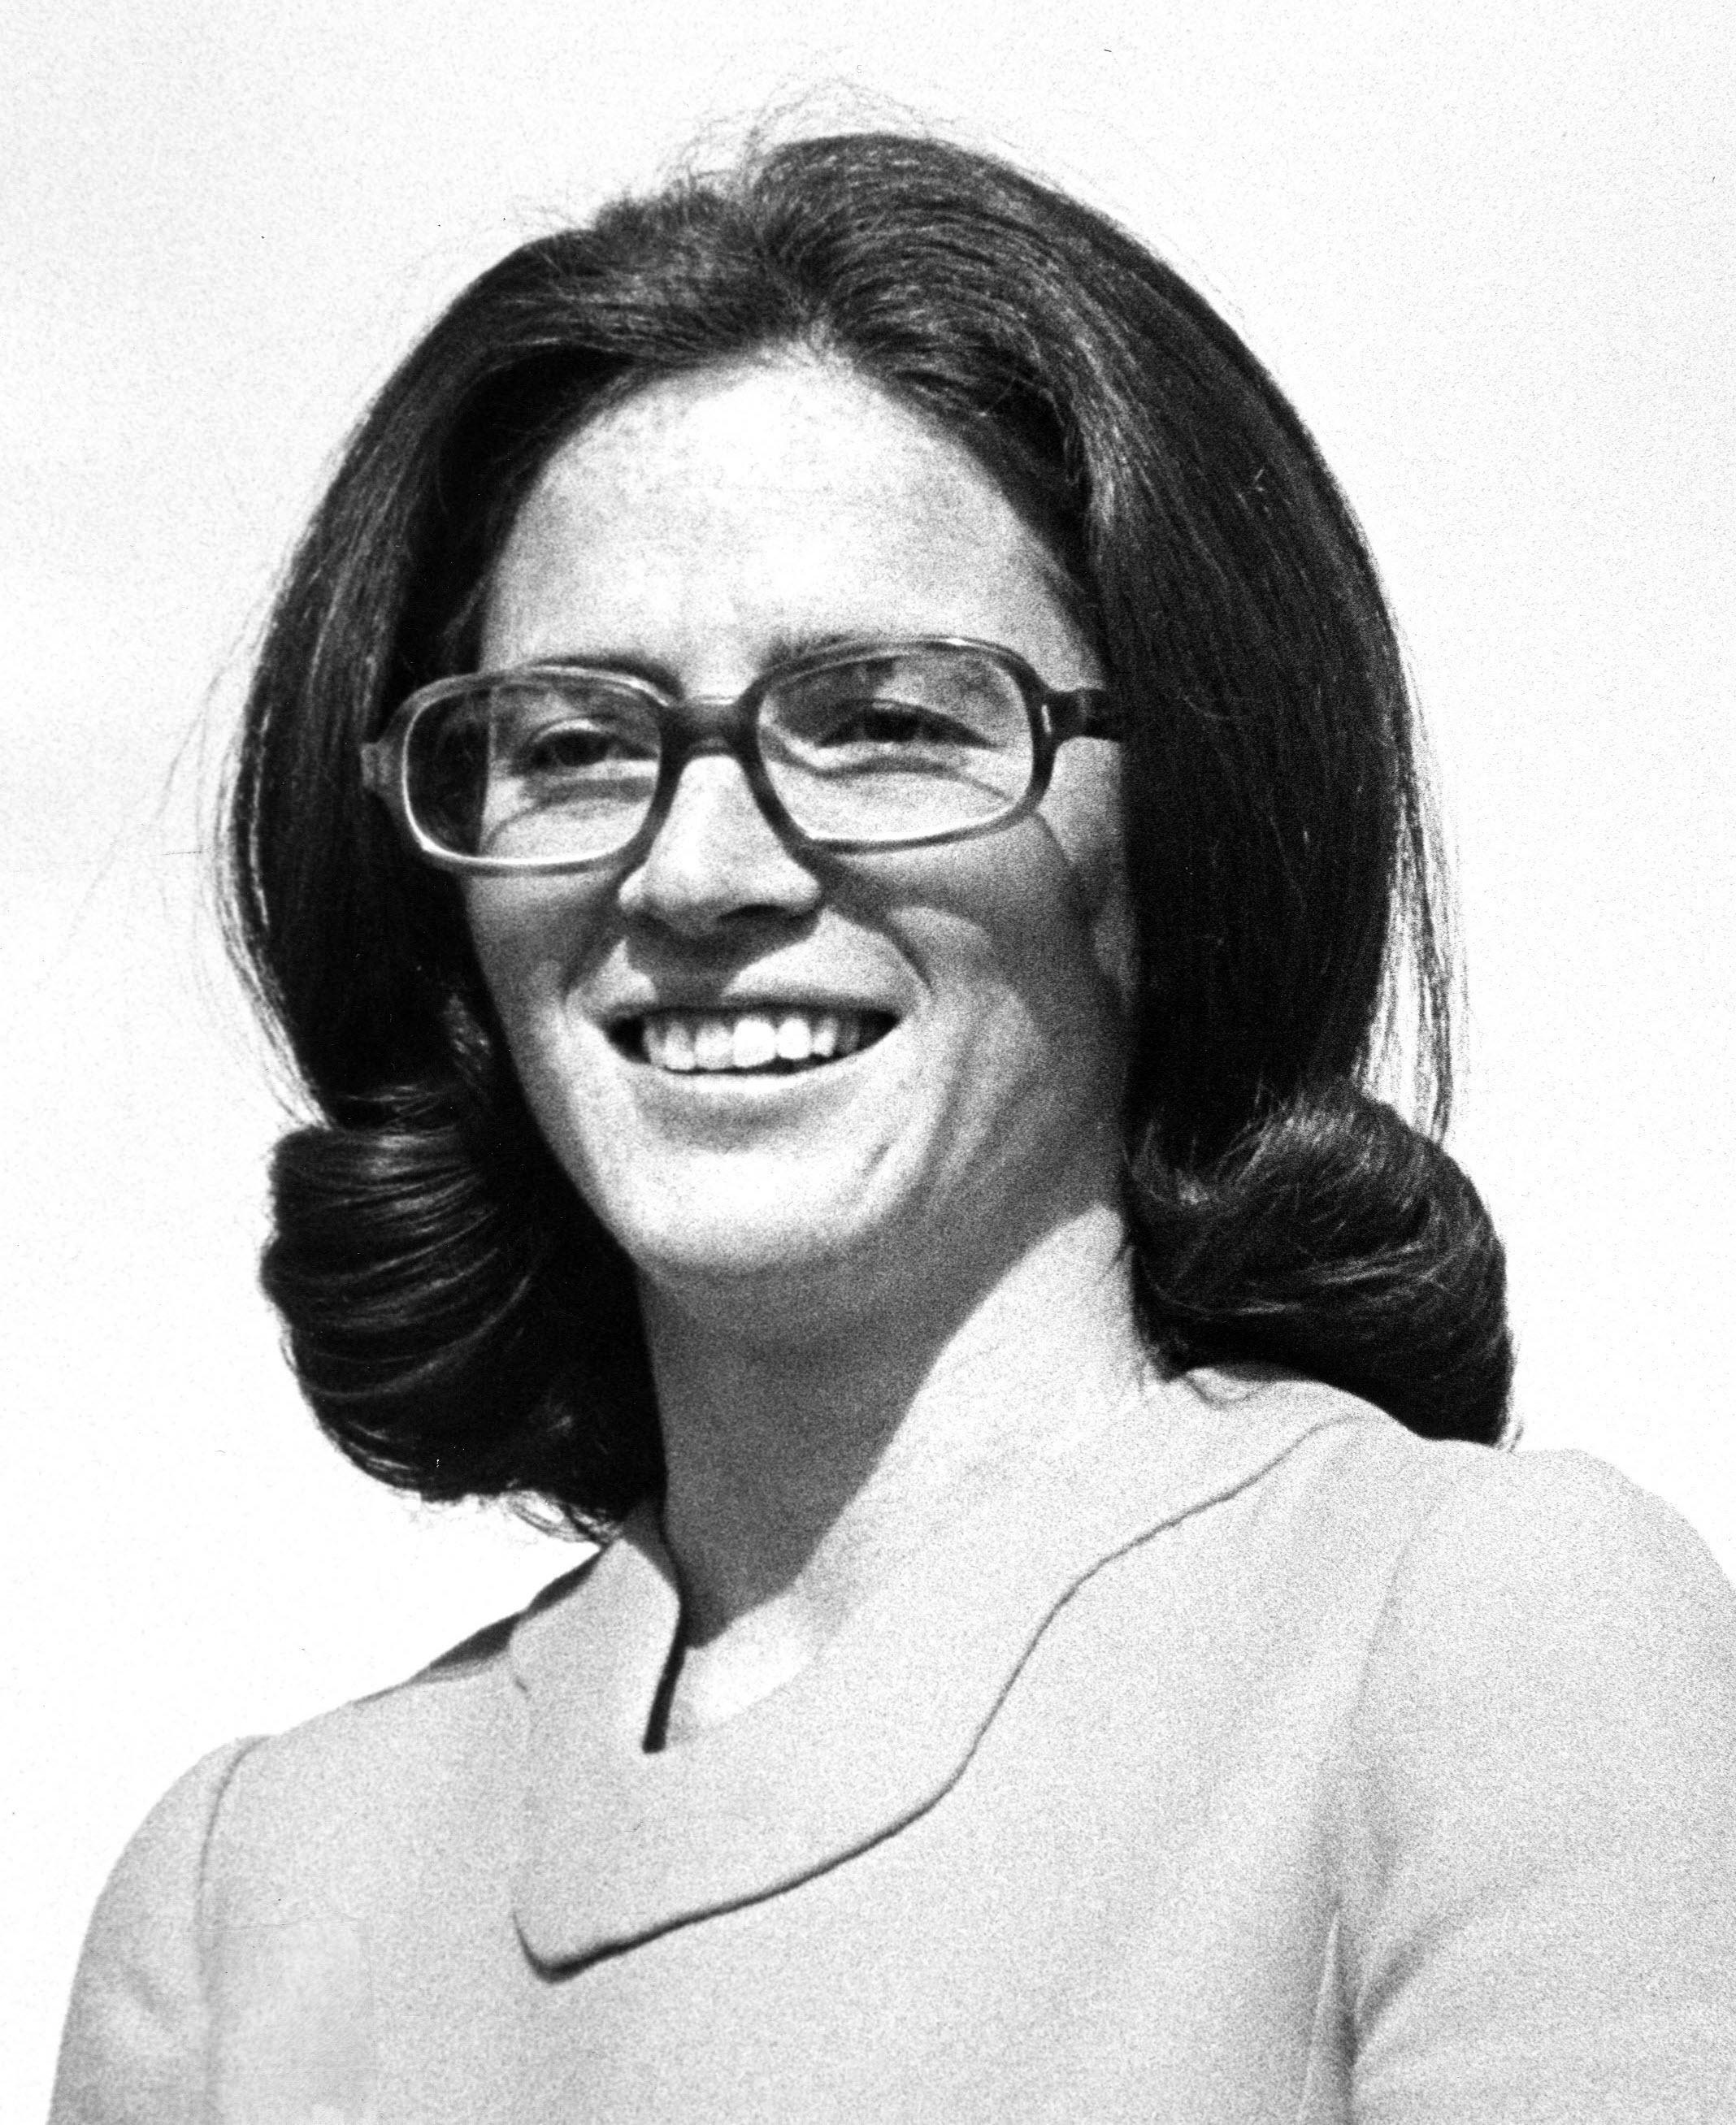 9a66c0aa7fe Elizabeth Holtzman - Wikipedia